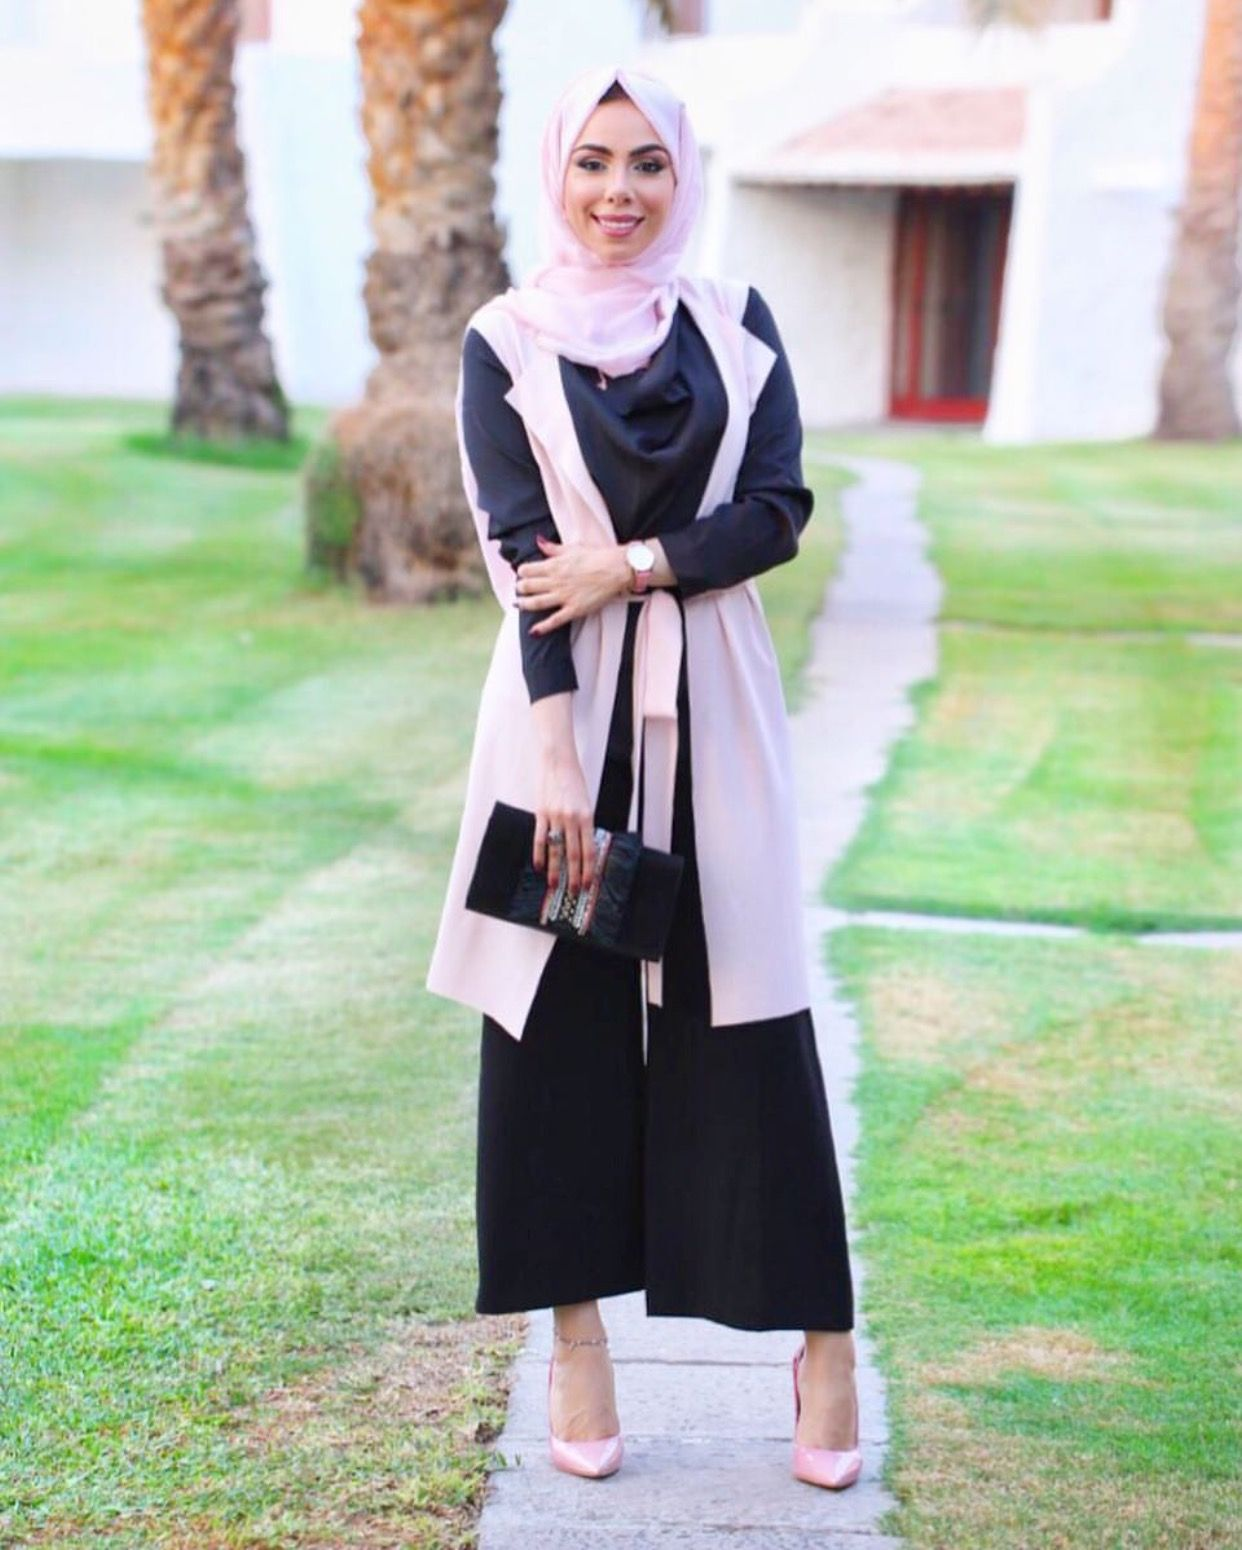 Extrêmement Pinterest @adarkurdish | Mode hijab | Pinterest | Mode hijab et Mode KL39